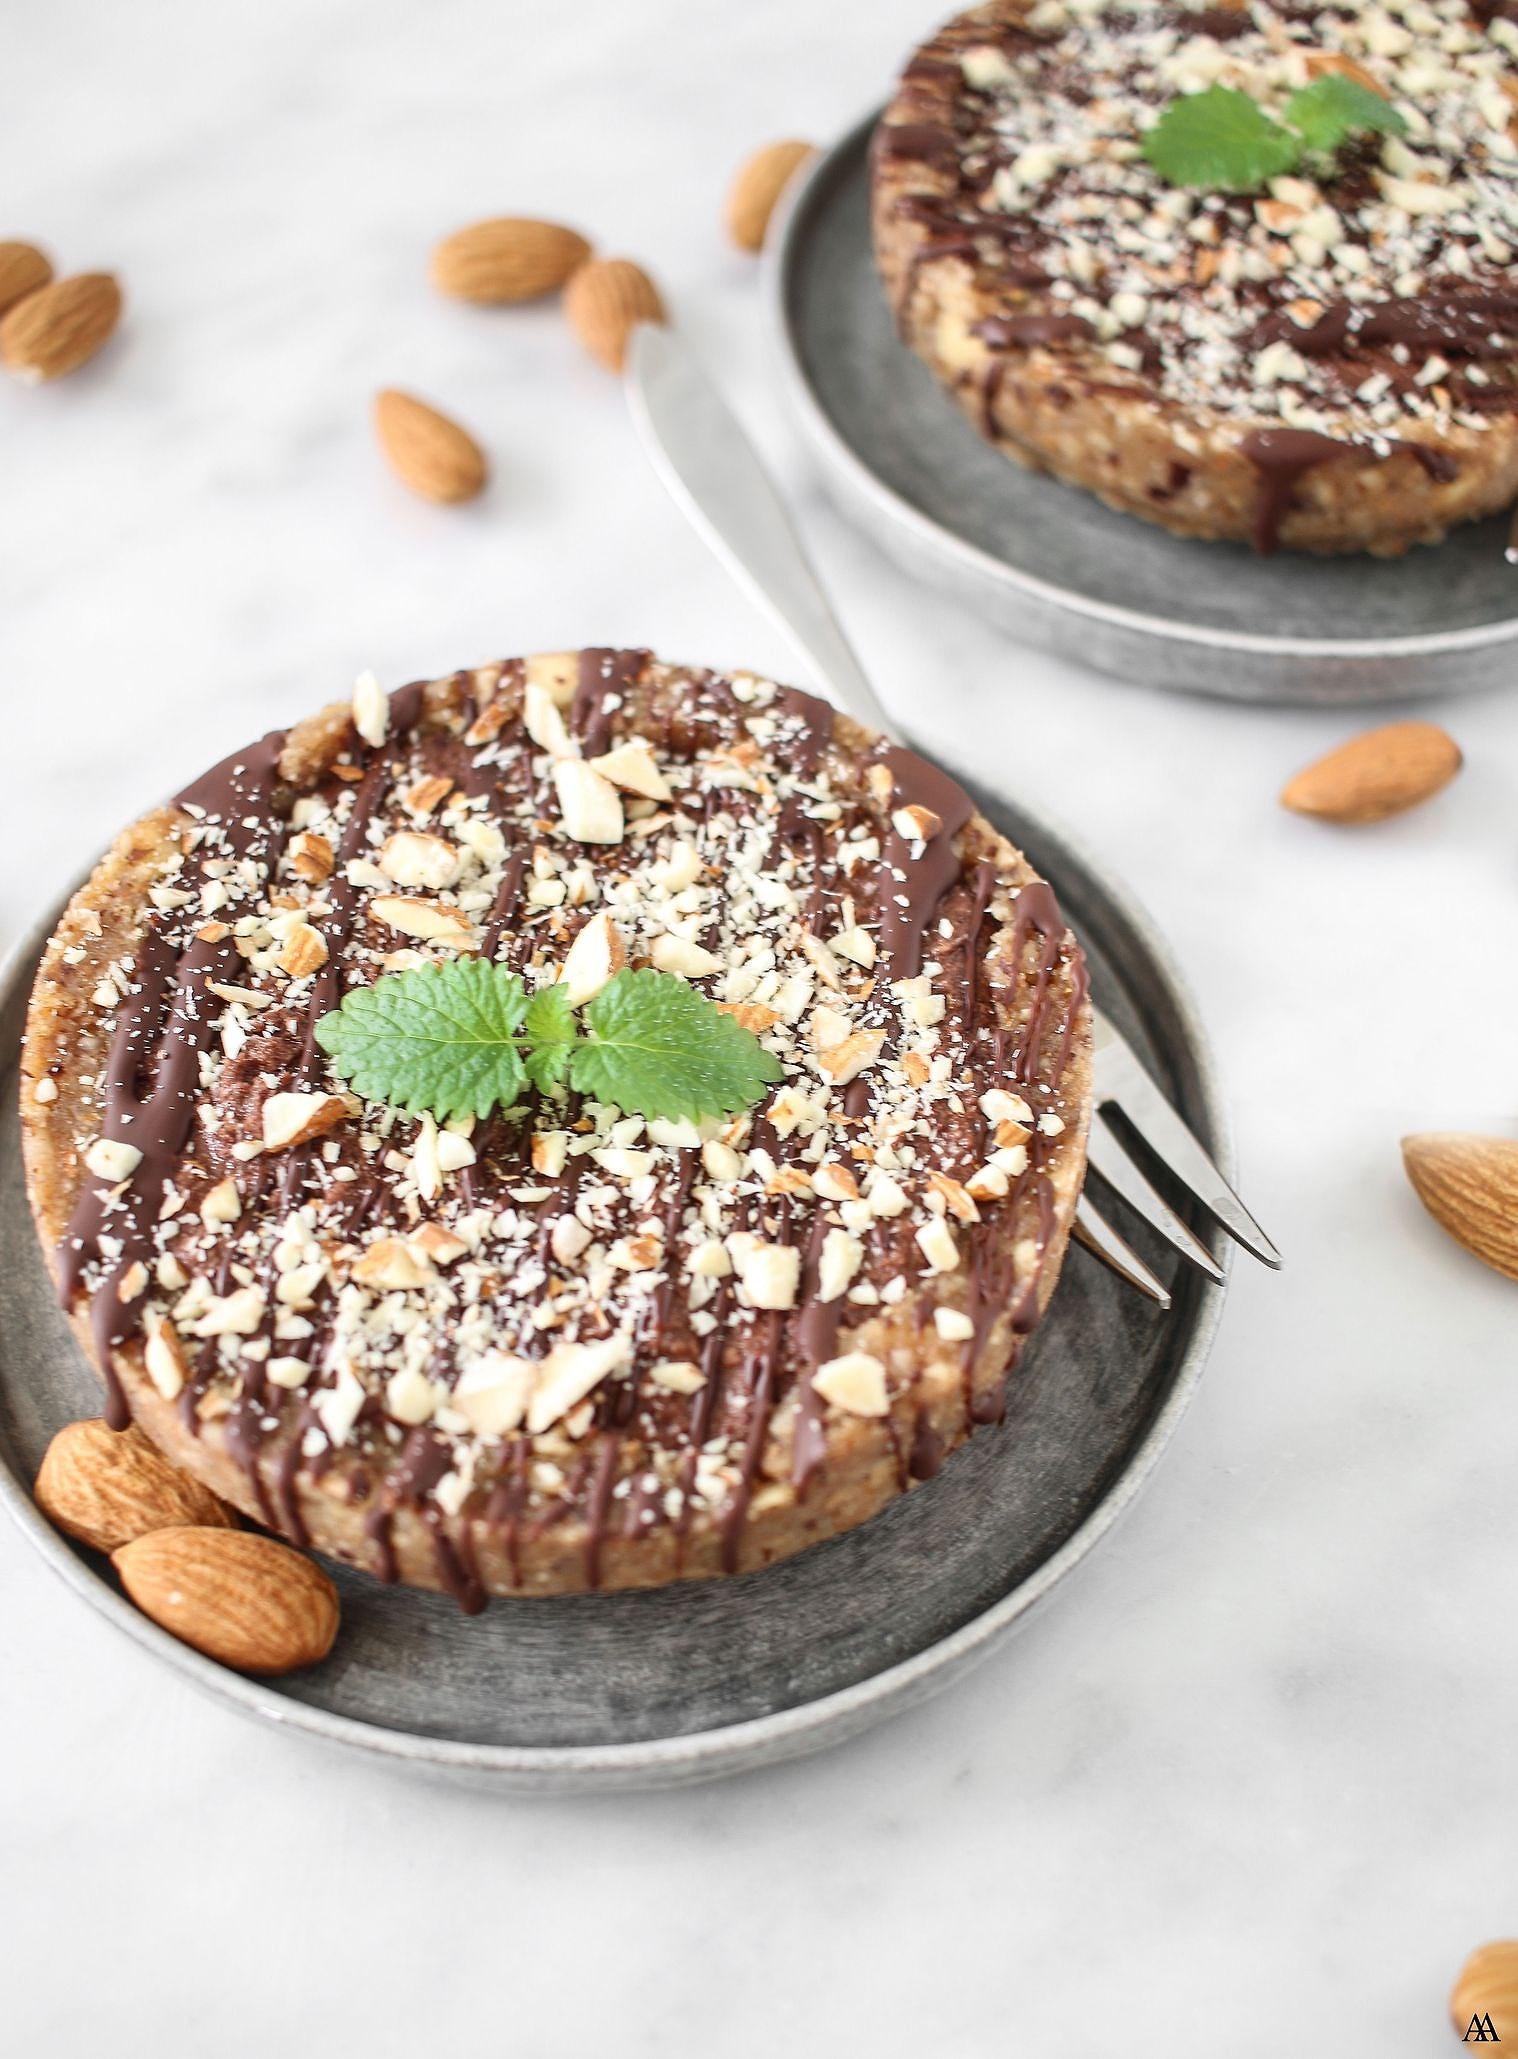 Raw Mandelcheesecake